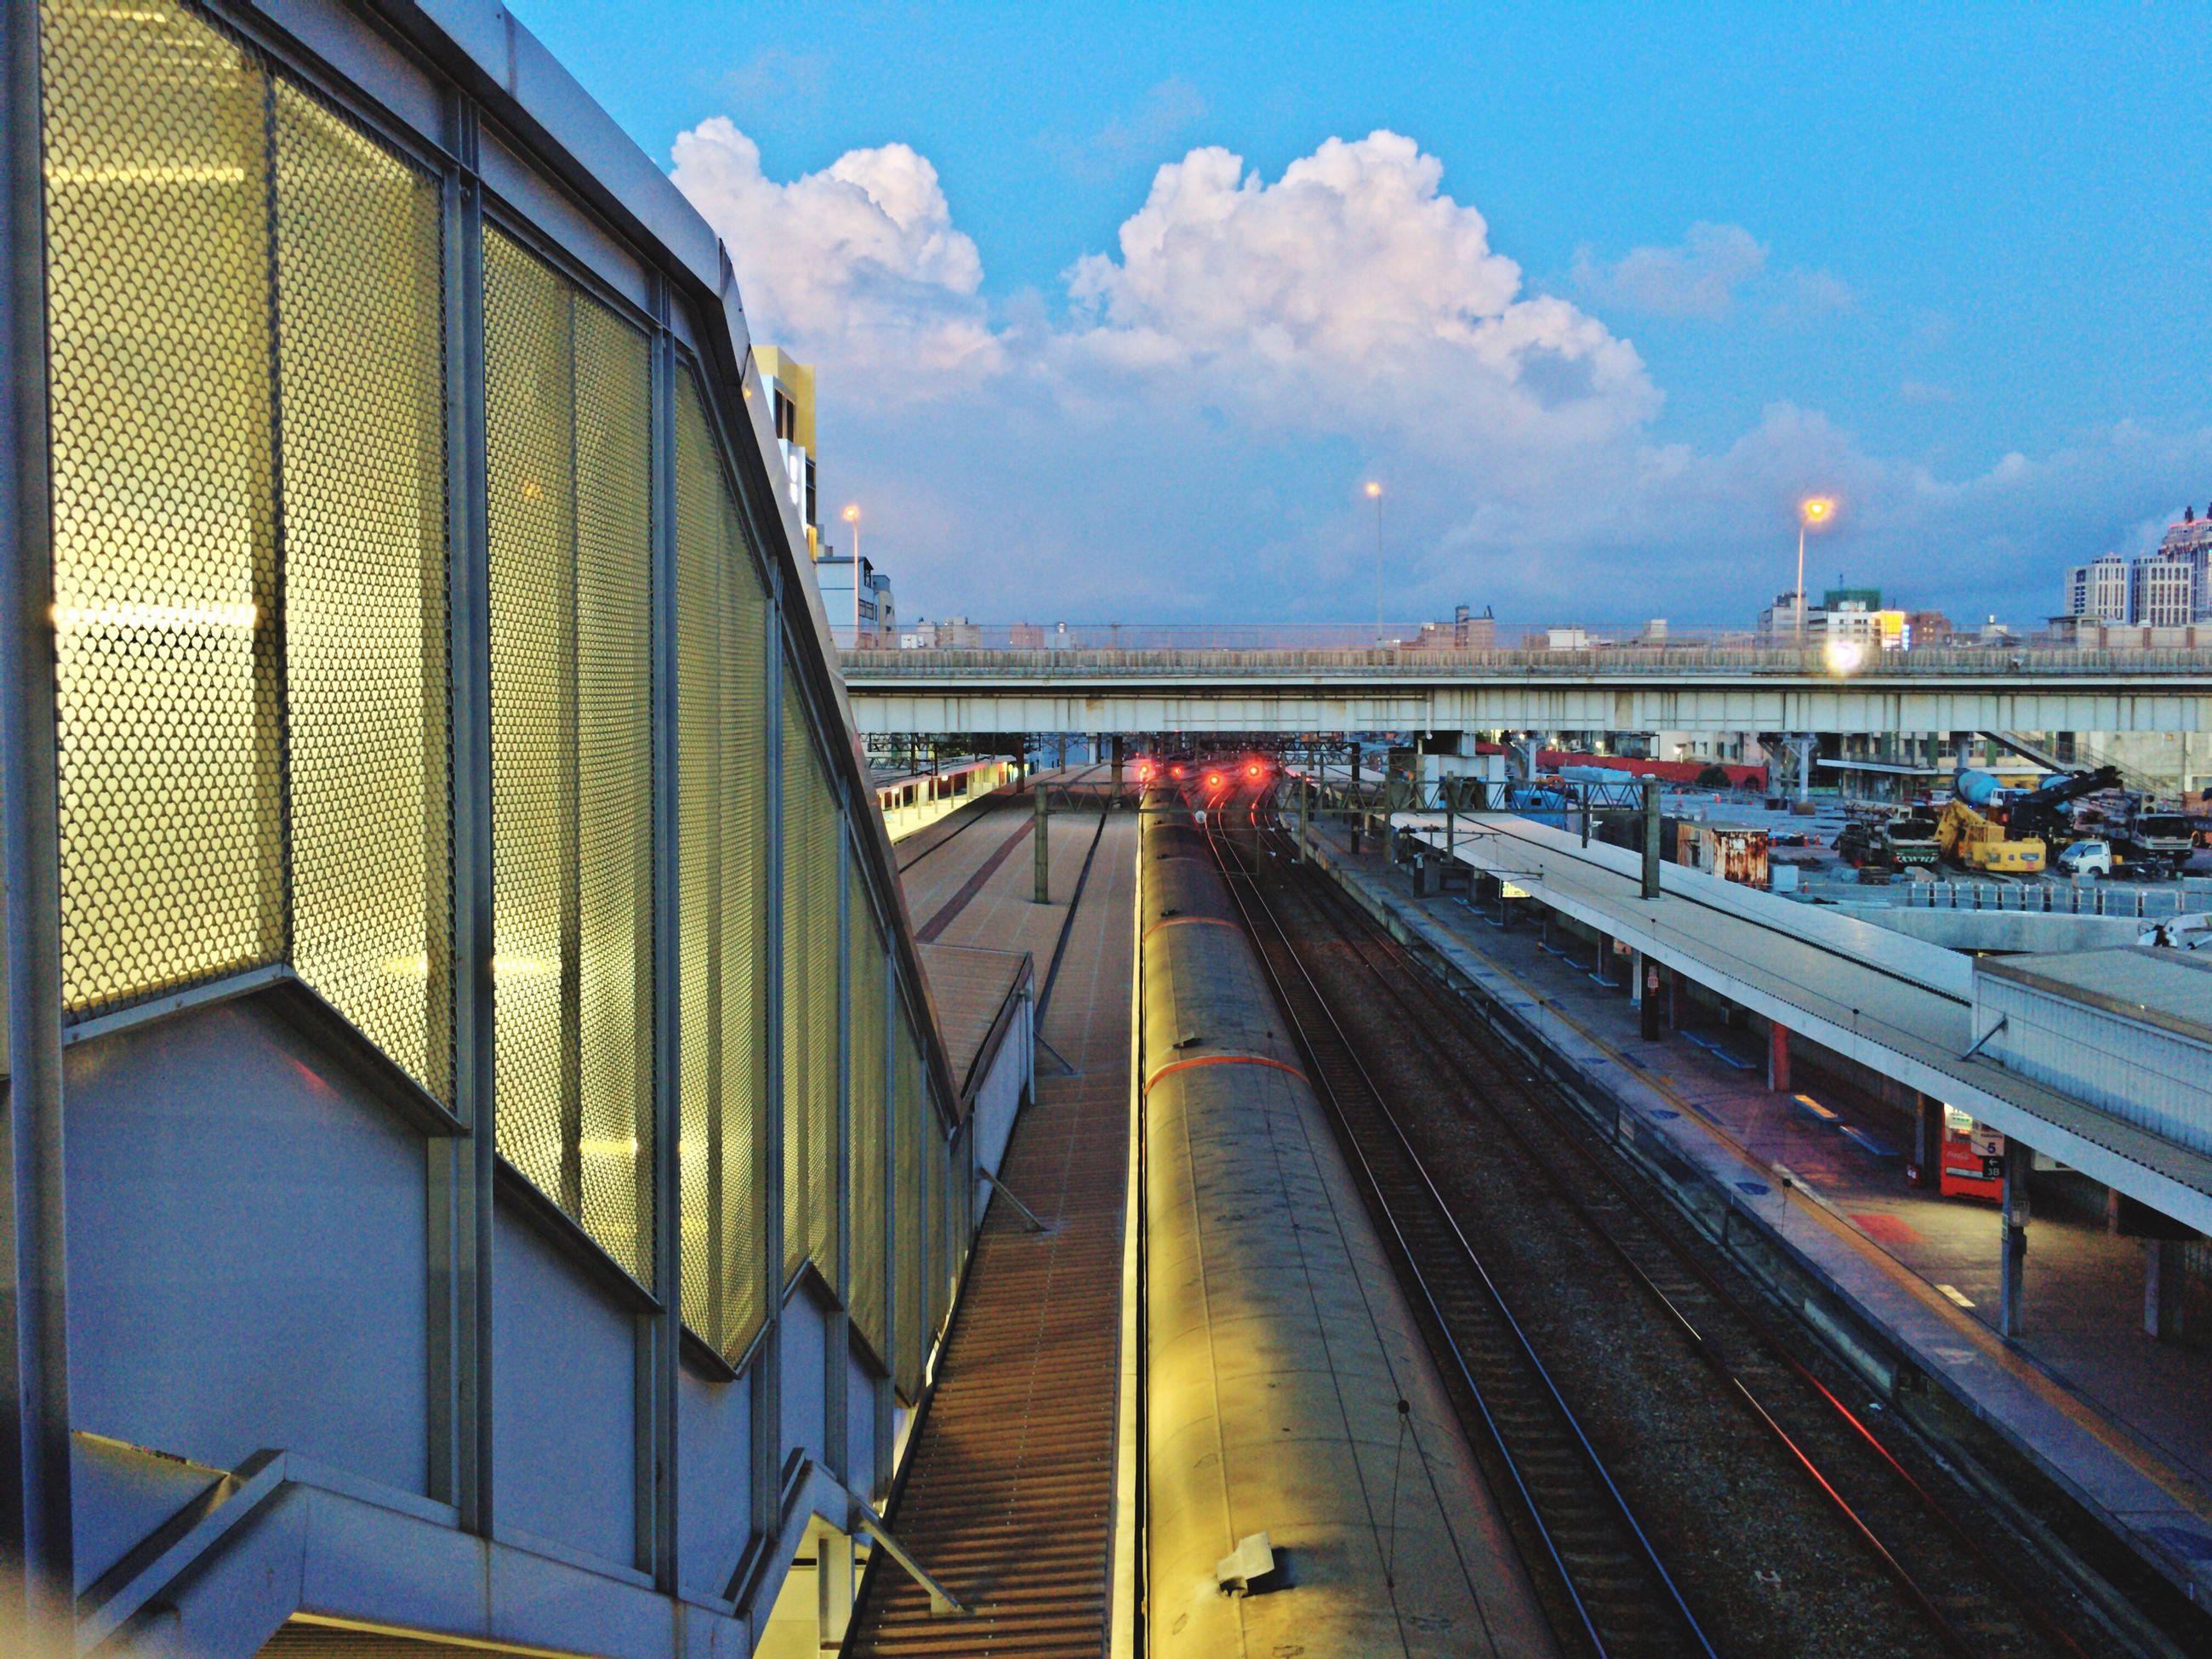 transportation, sky, rail transportation, railroad track, public transportation, mode of transport, built structure, train - vehicle, cloud - sky, architecture, no people, outdoors, day, building exterior